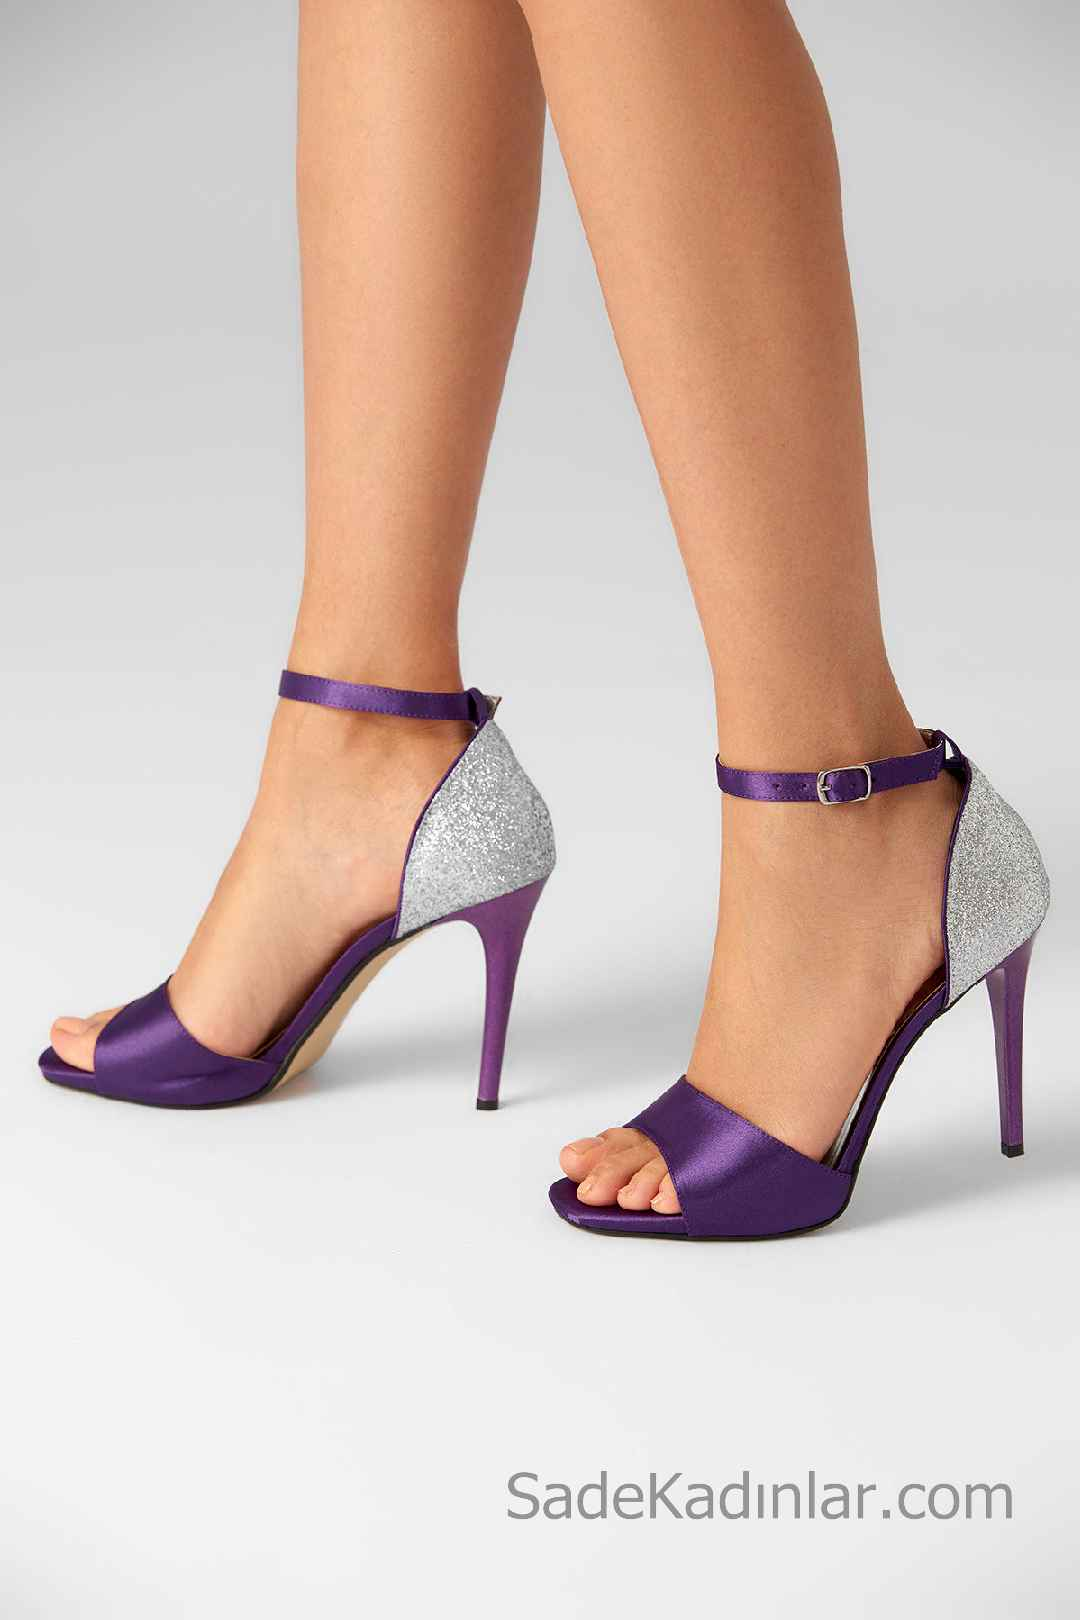 2019 Topuklu Sandalet Modelleri